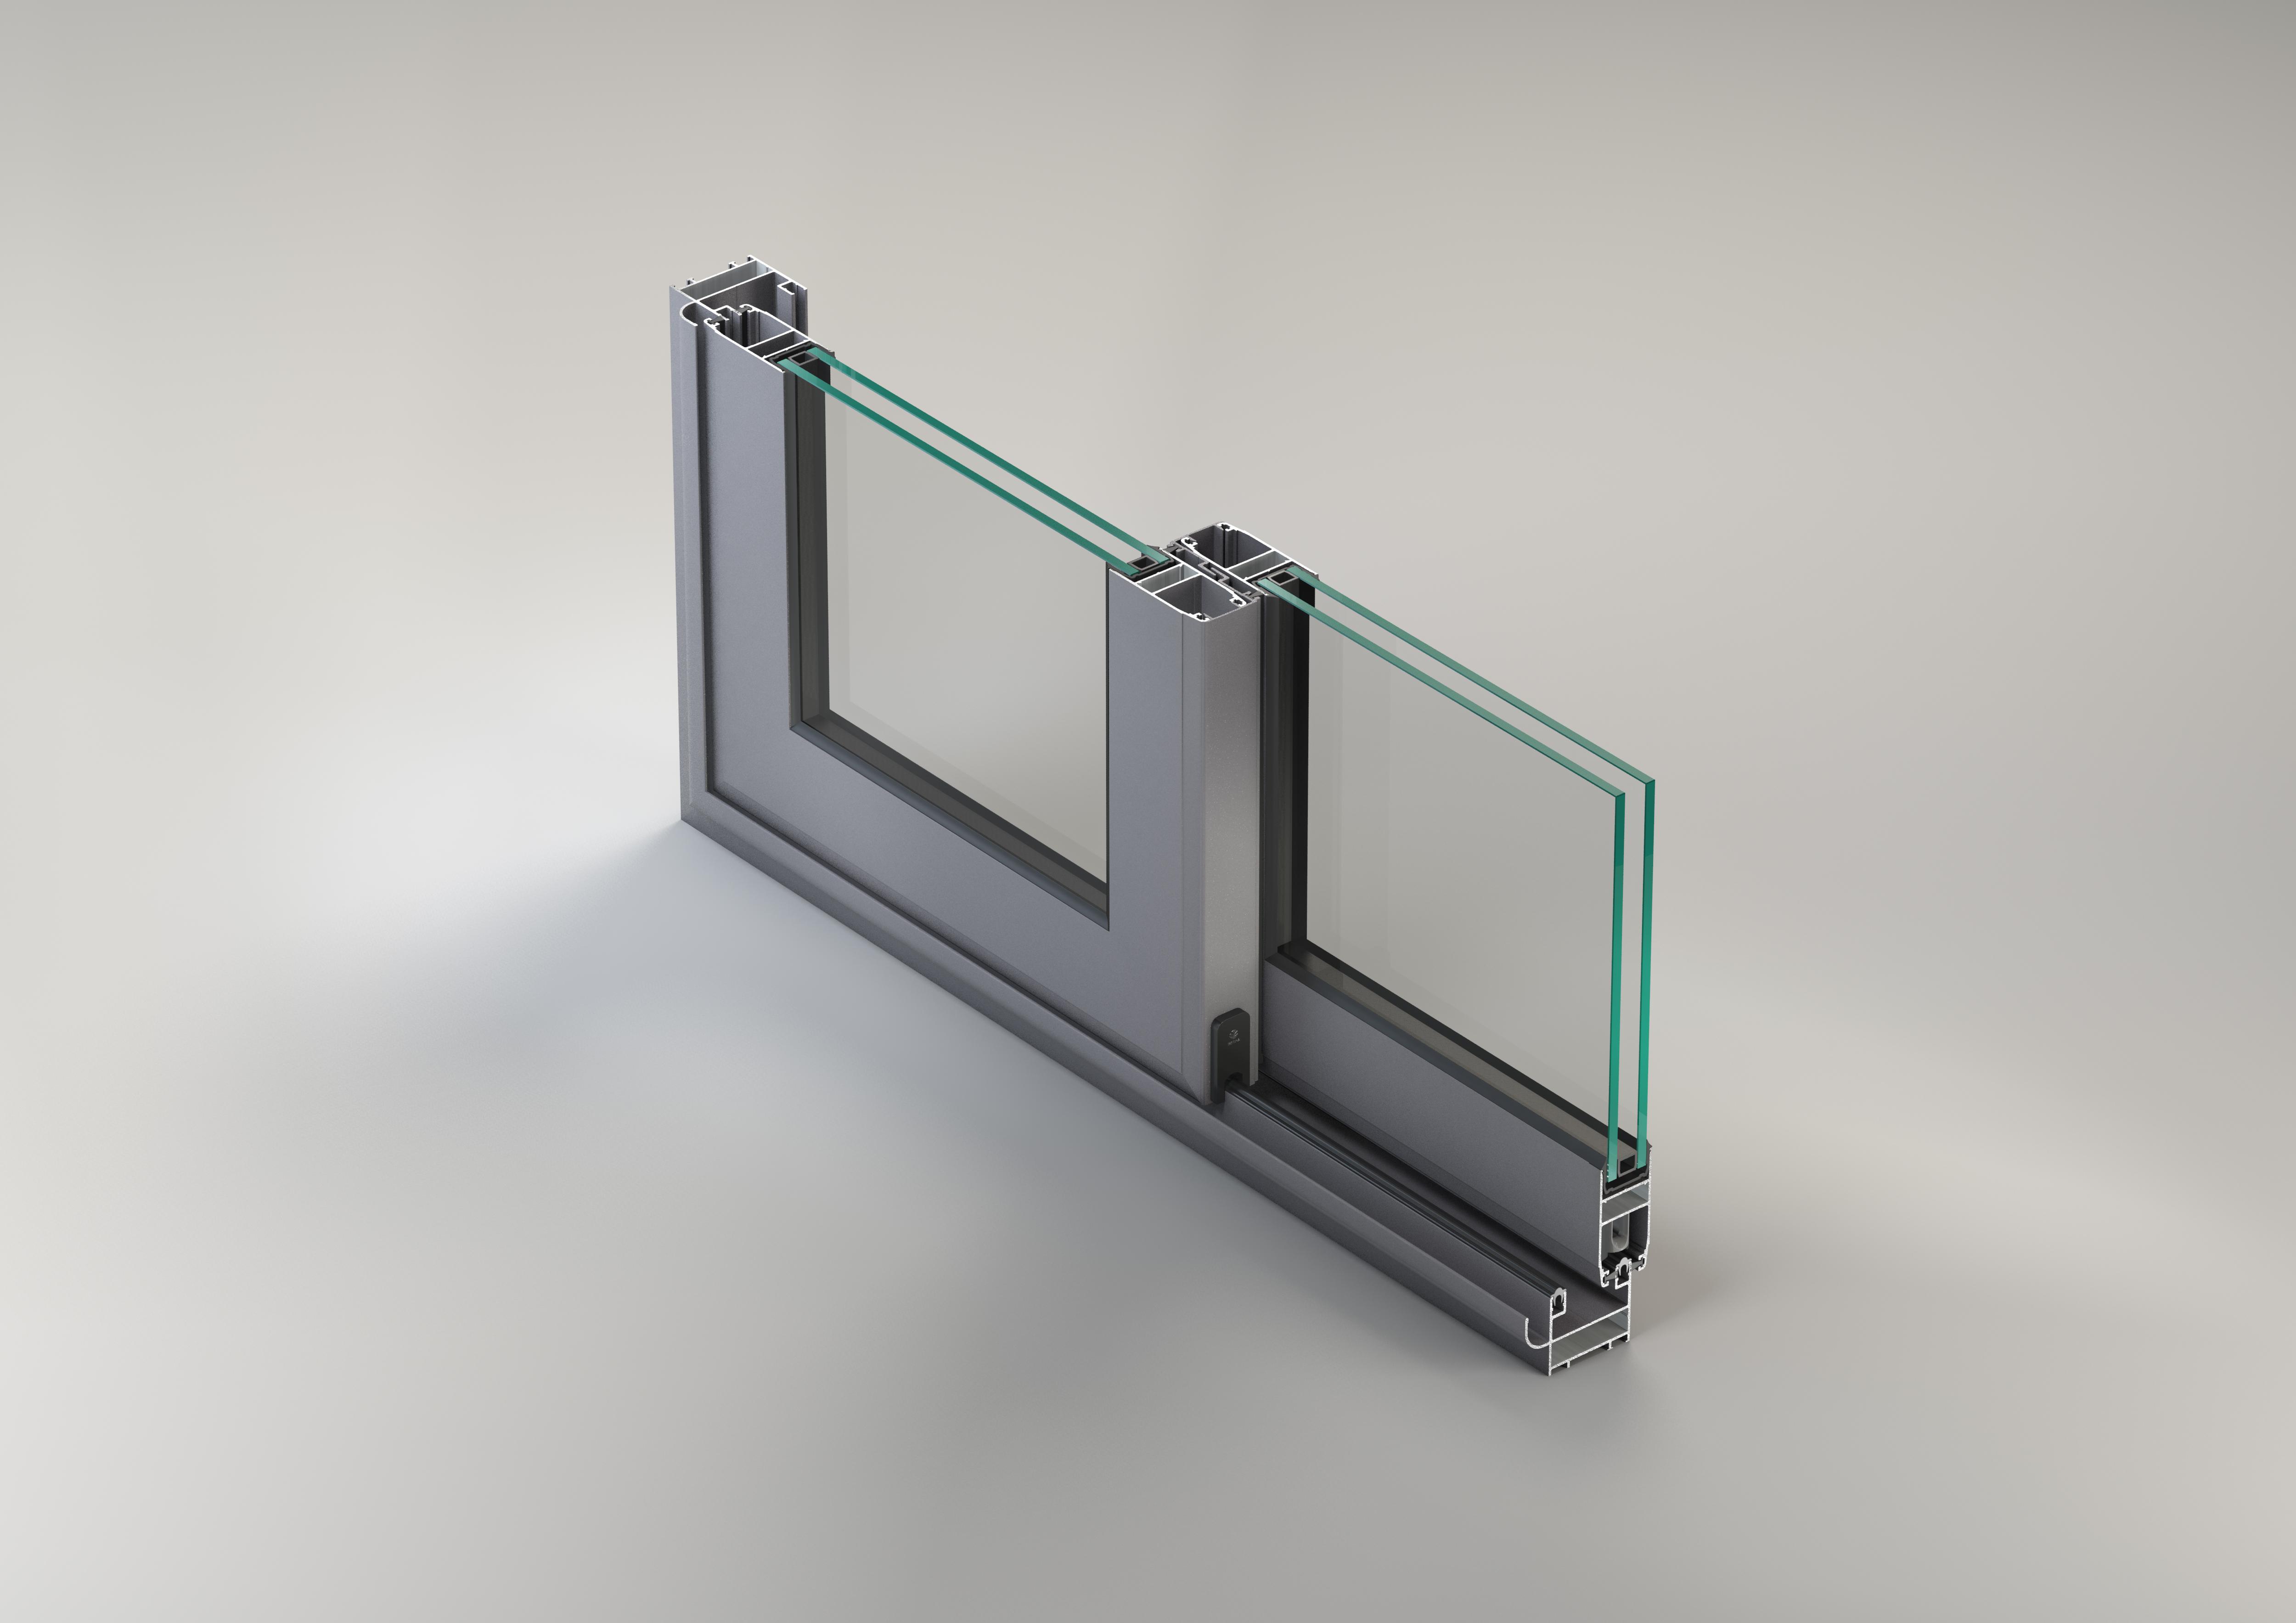 Sisteme aluminiu pentru usi glisante LEYKOM METRA - Poza 1